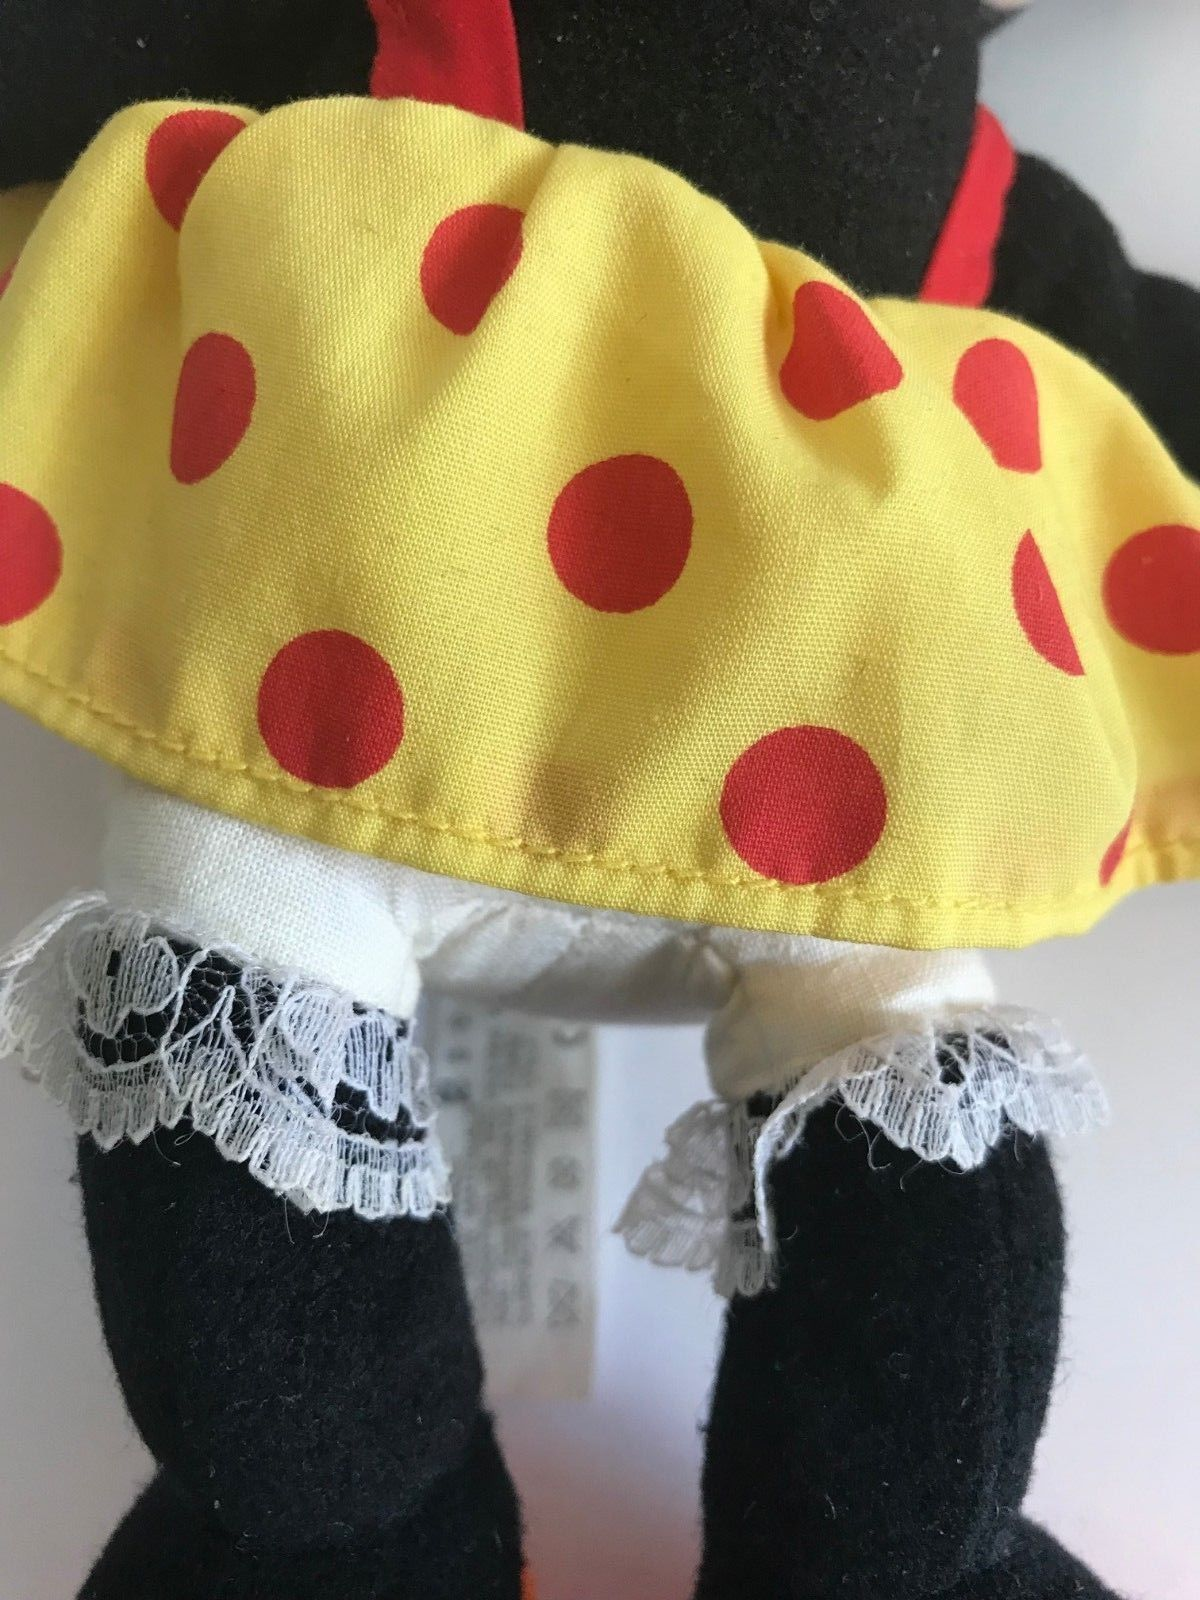 Mattel Arcotoys Minnie Mouse Yellow Red Polka Dot Flower Hat Plush Stuffed Doll image 9